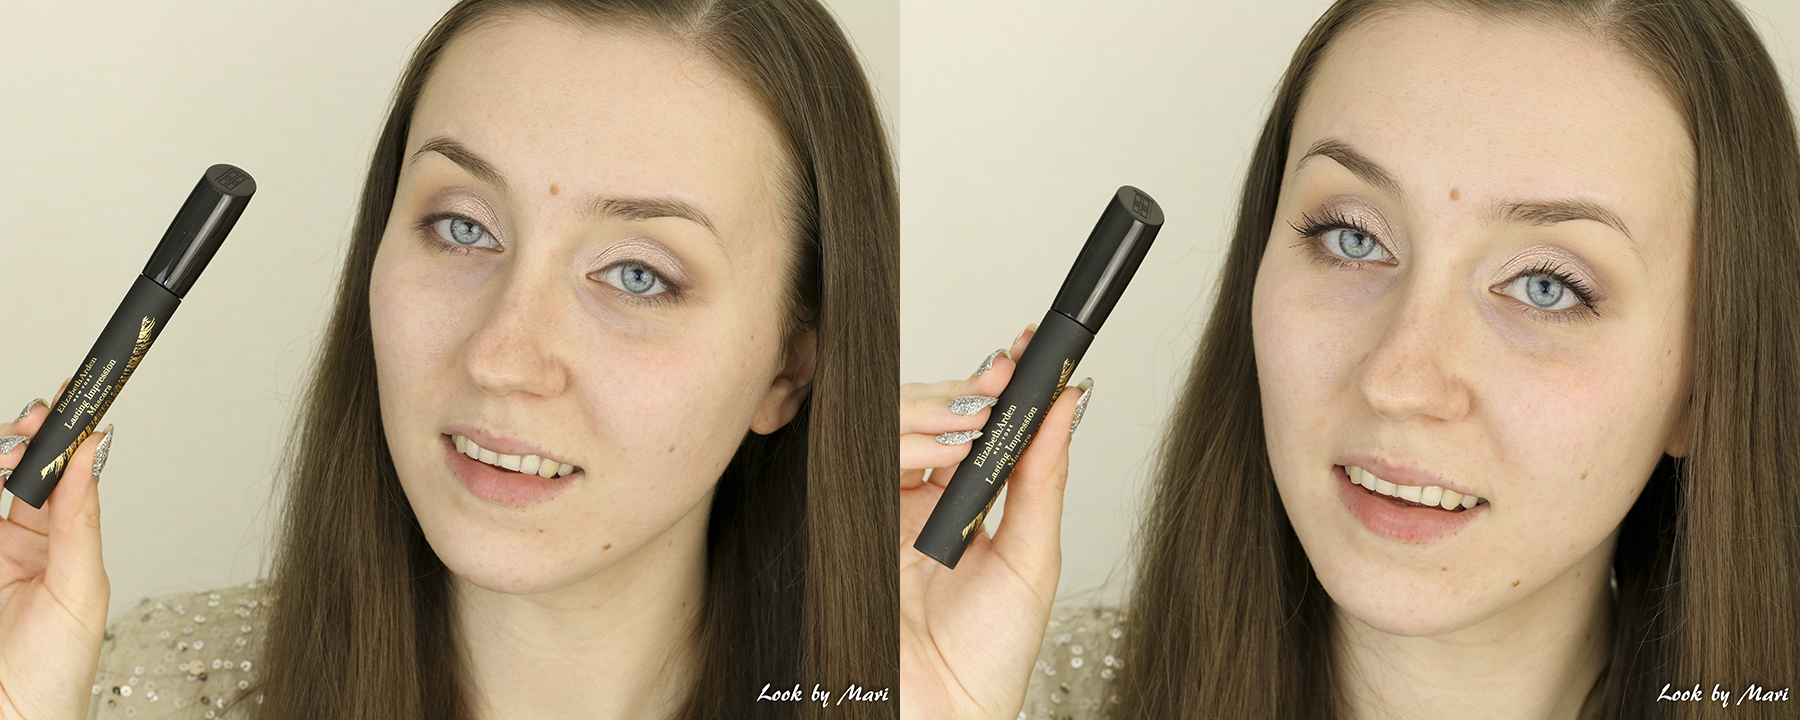 4 elizabet arden lasting impression mascara review ripsiväri kokemuksia